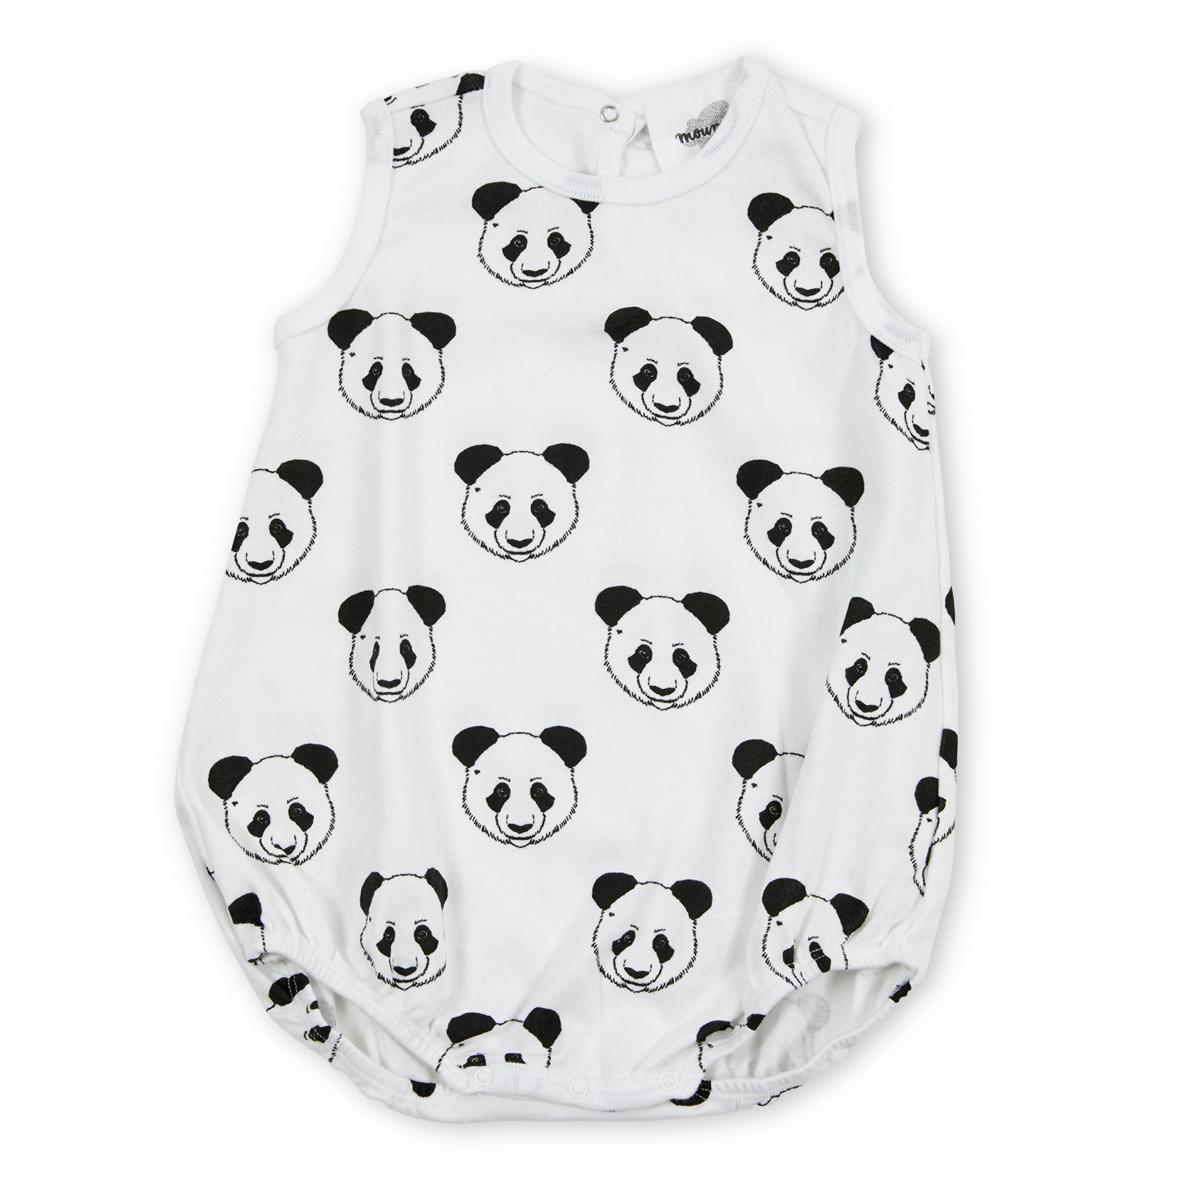 Robe & Combinaison Baba Barboteuse Panda - 18 Mois Baba Barboteuse Panda - 18 Mois